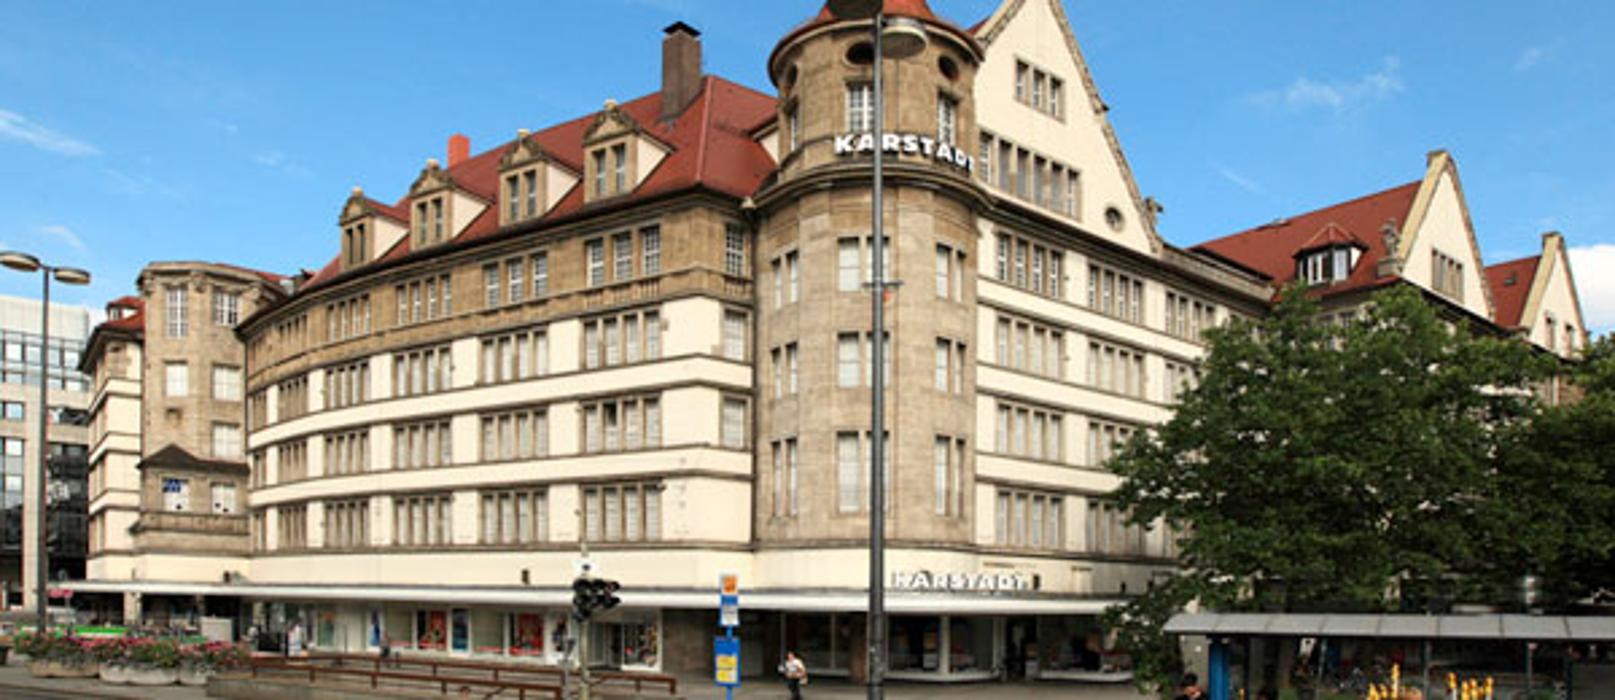 GALERIA (Karstadt) München Bahnhofplatz, Bahnhofplatz in München